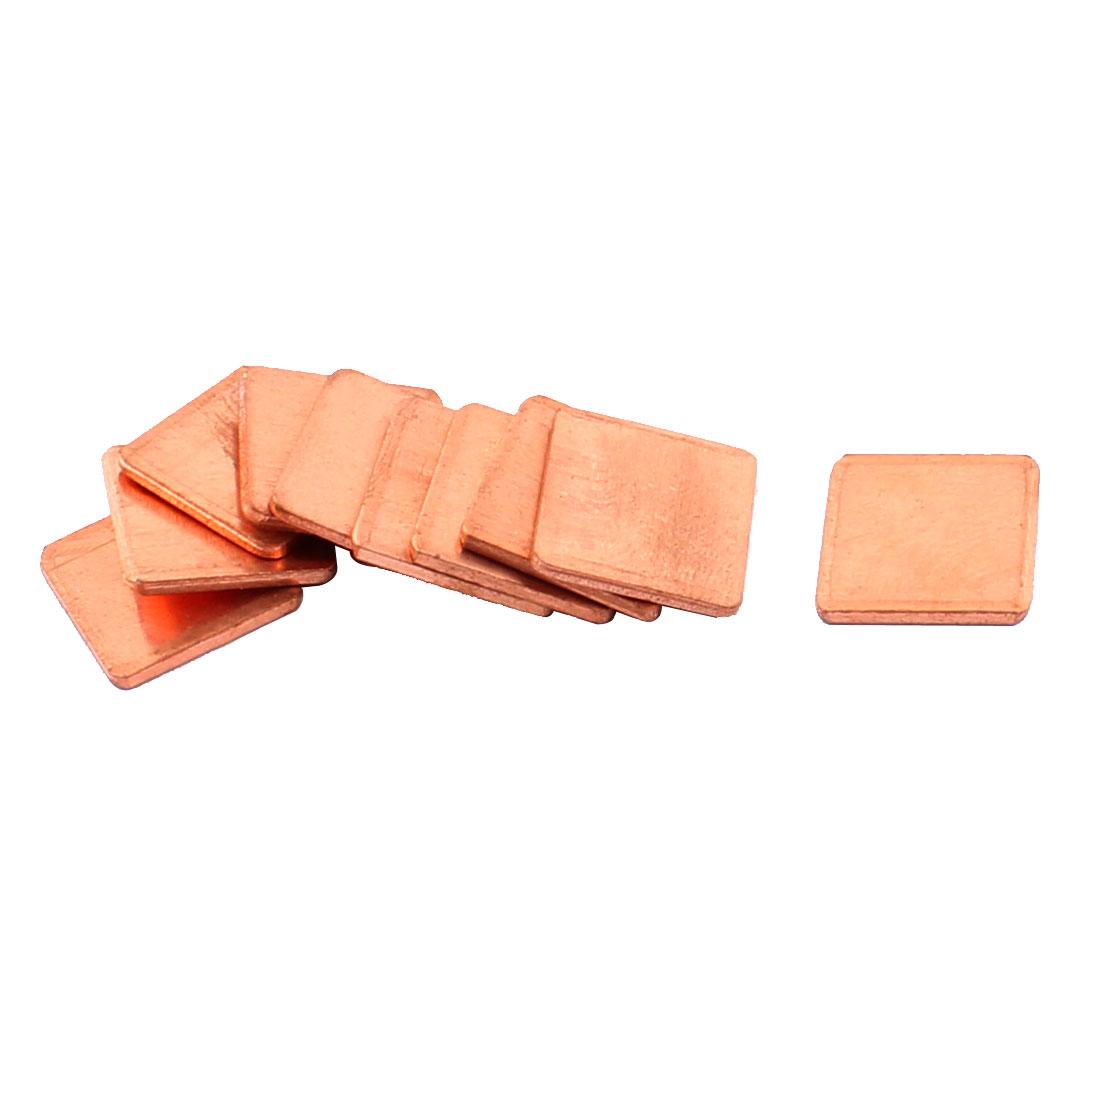 10pcs 15mmx15mmx1.5mm Copper Square Heatsink Thermal Pad Shim for PC Laptop CPU